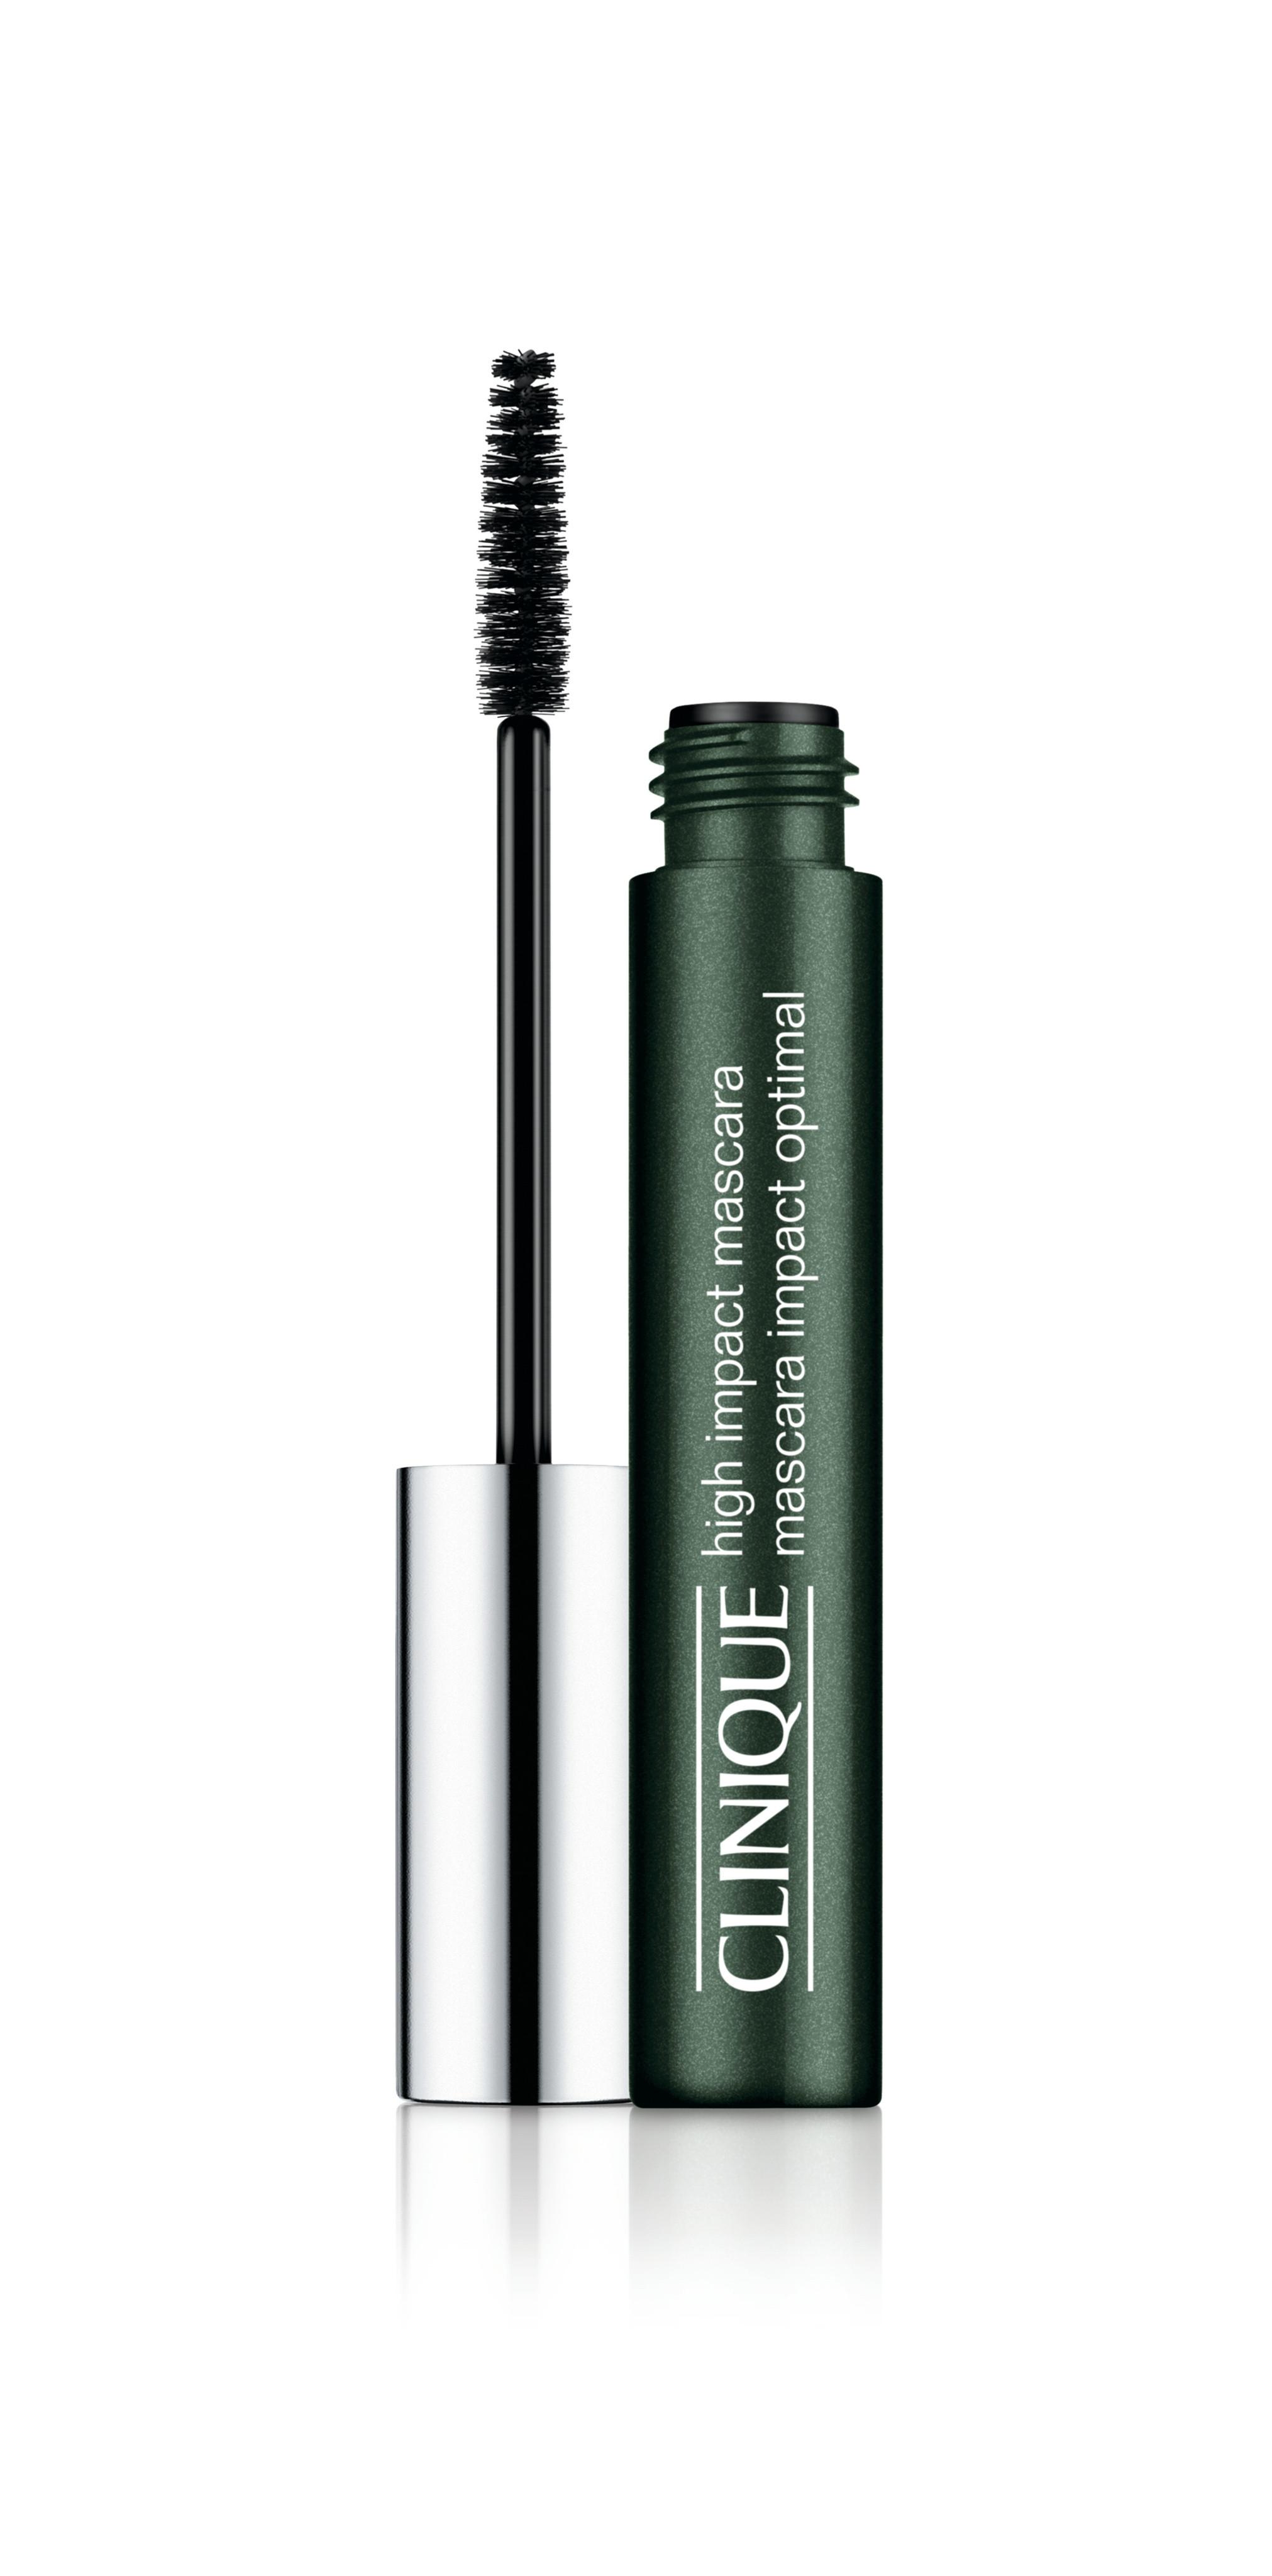 Clinique high impact mascara - 02 black brown 8 ml, 02 BLACK BROWN, large image number 0